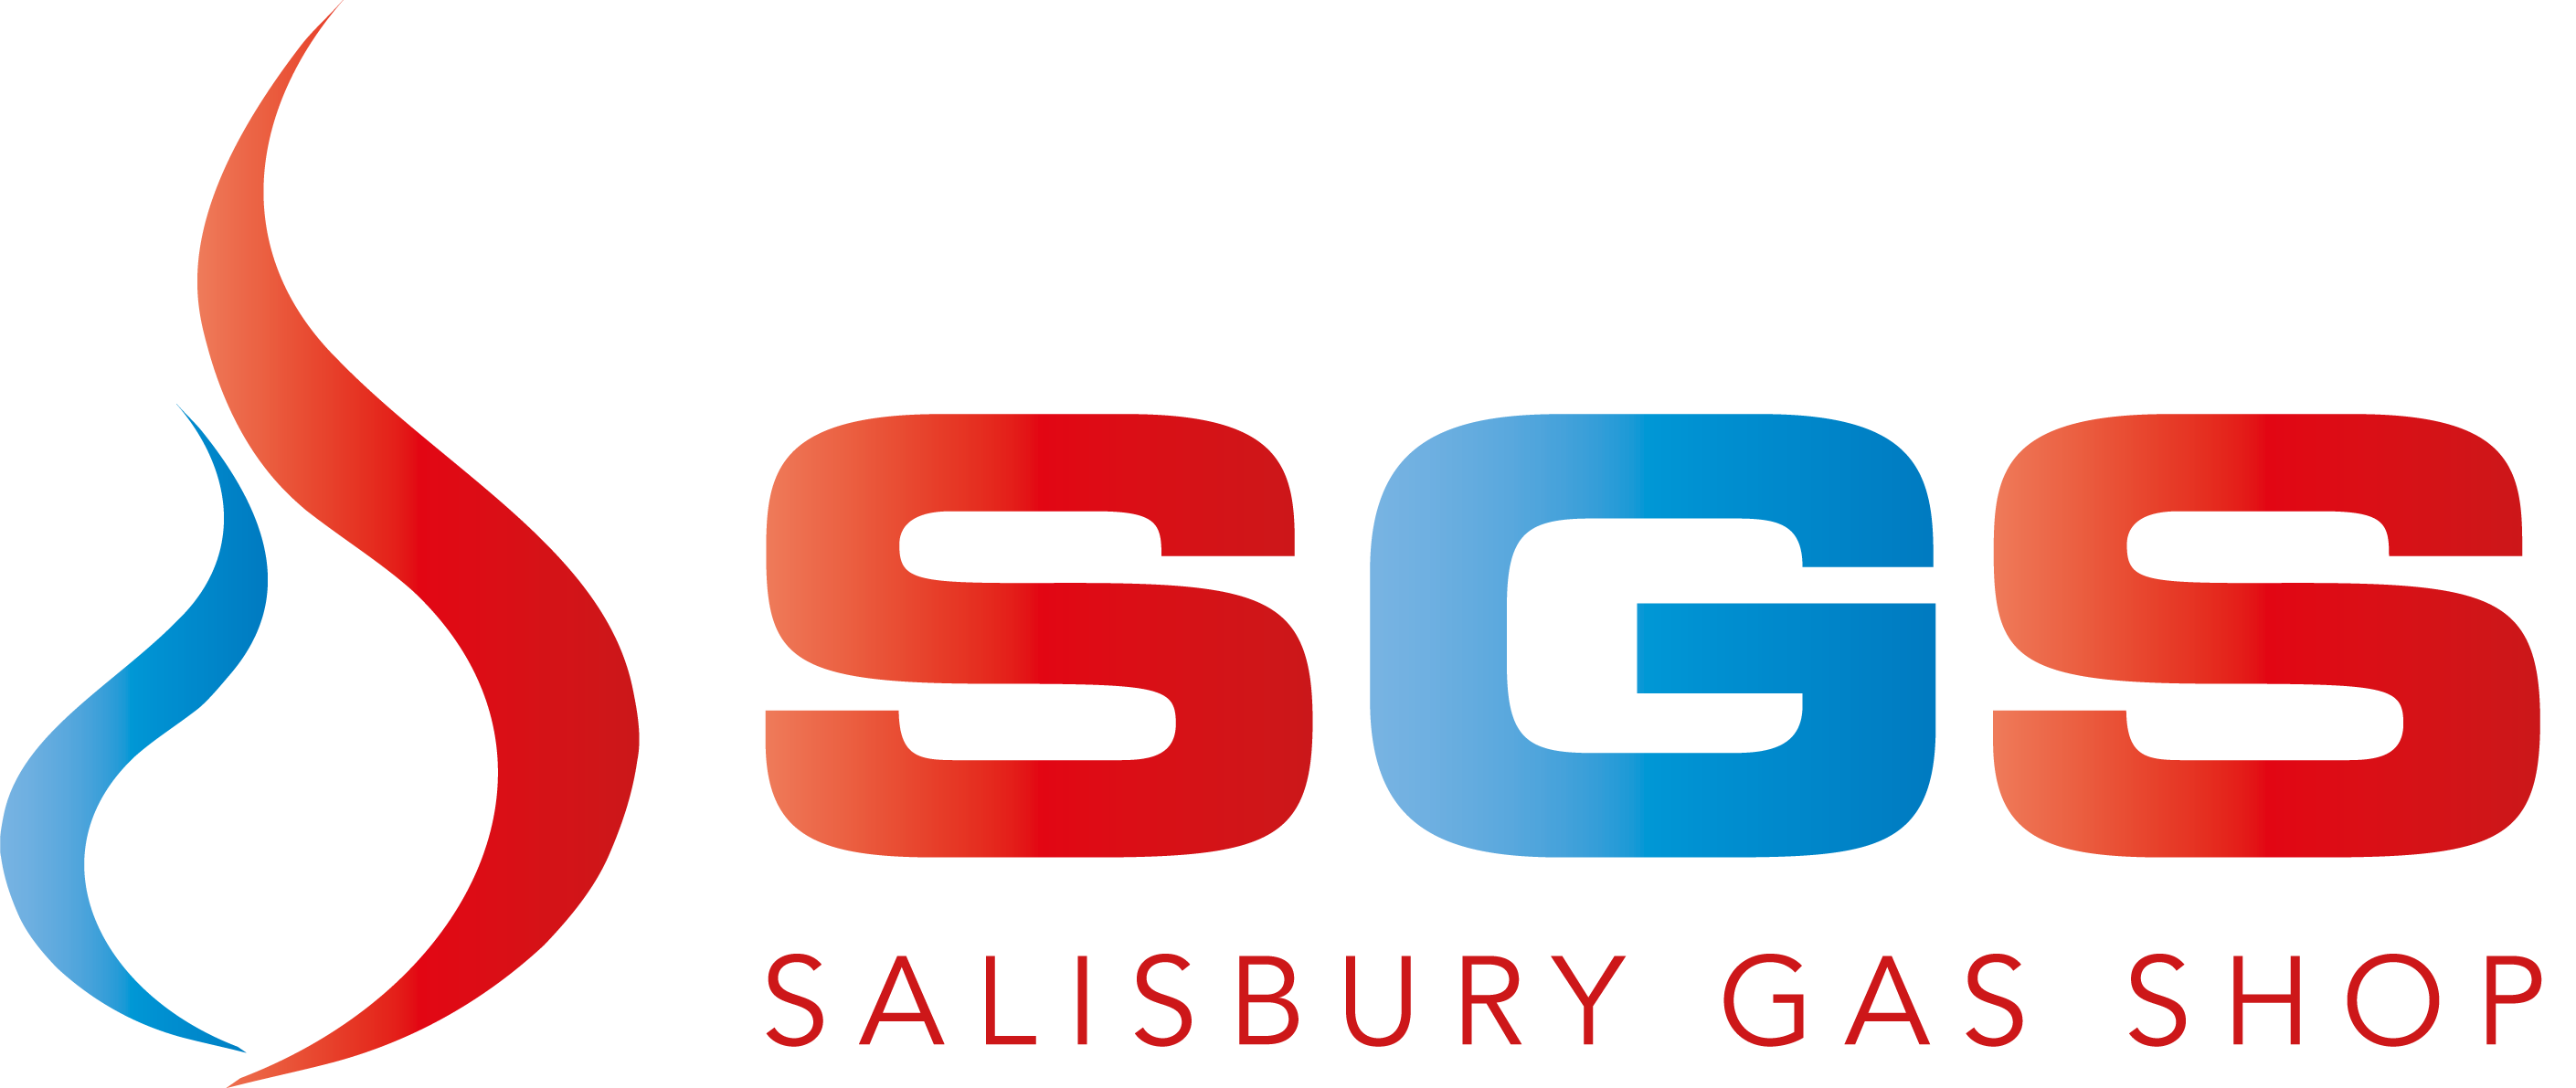 Salisbury Gas Shop